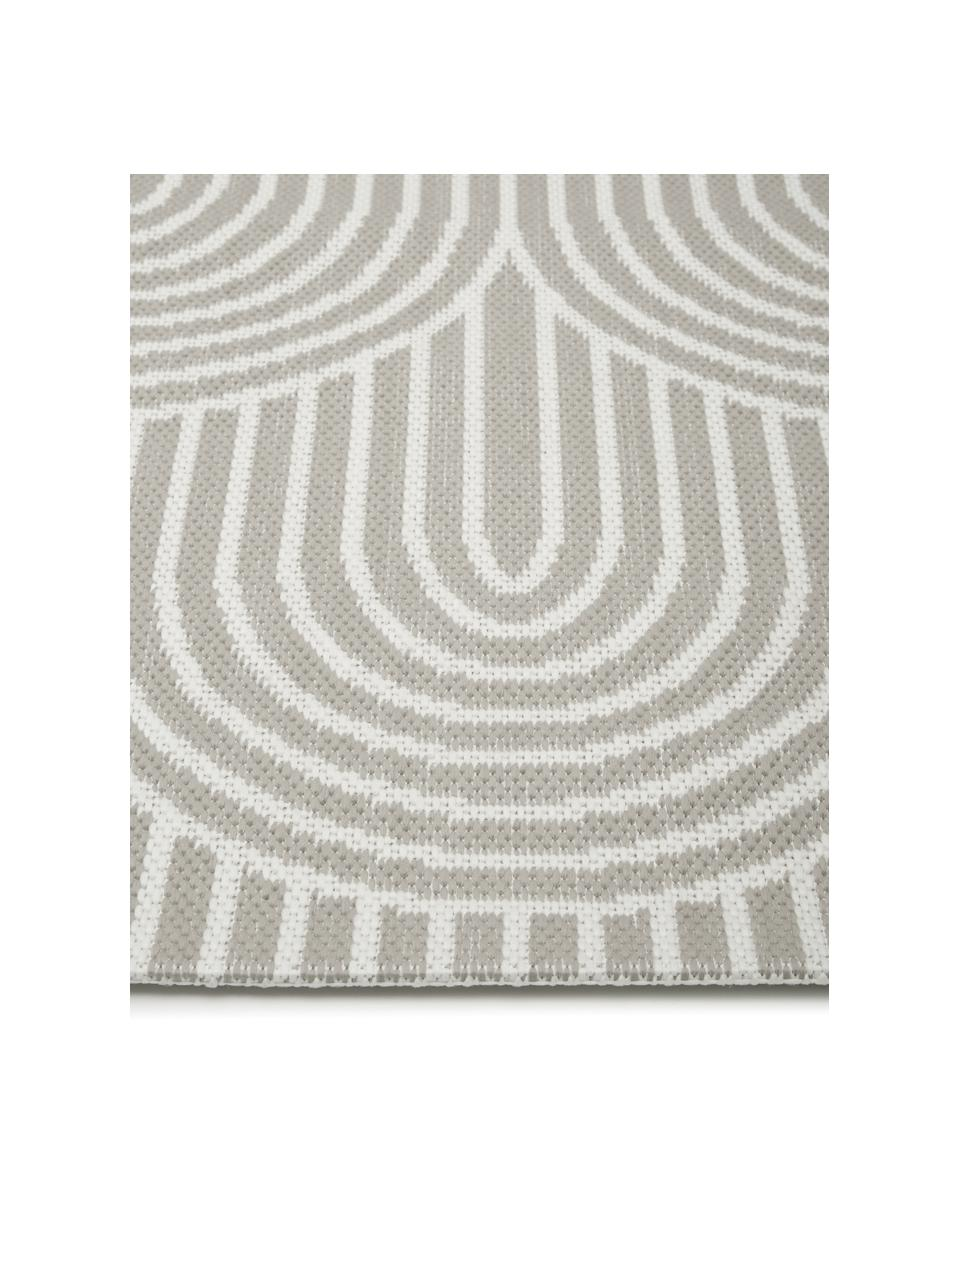 In- & outdoor vloerkleed Arches in grijs/crèmewit, 86% polypropyleen, 14% polyester, Grijs, wit, B 200 x L 290 cm (maat L)